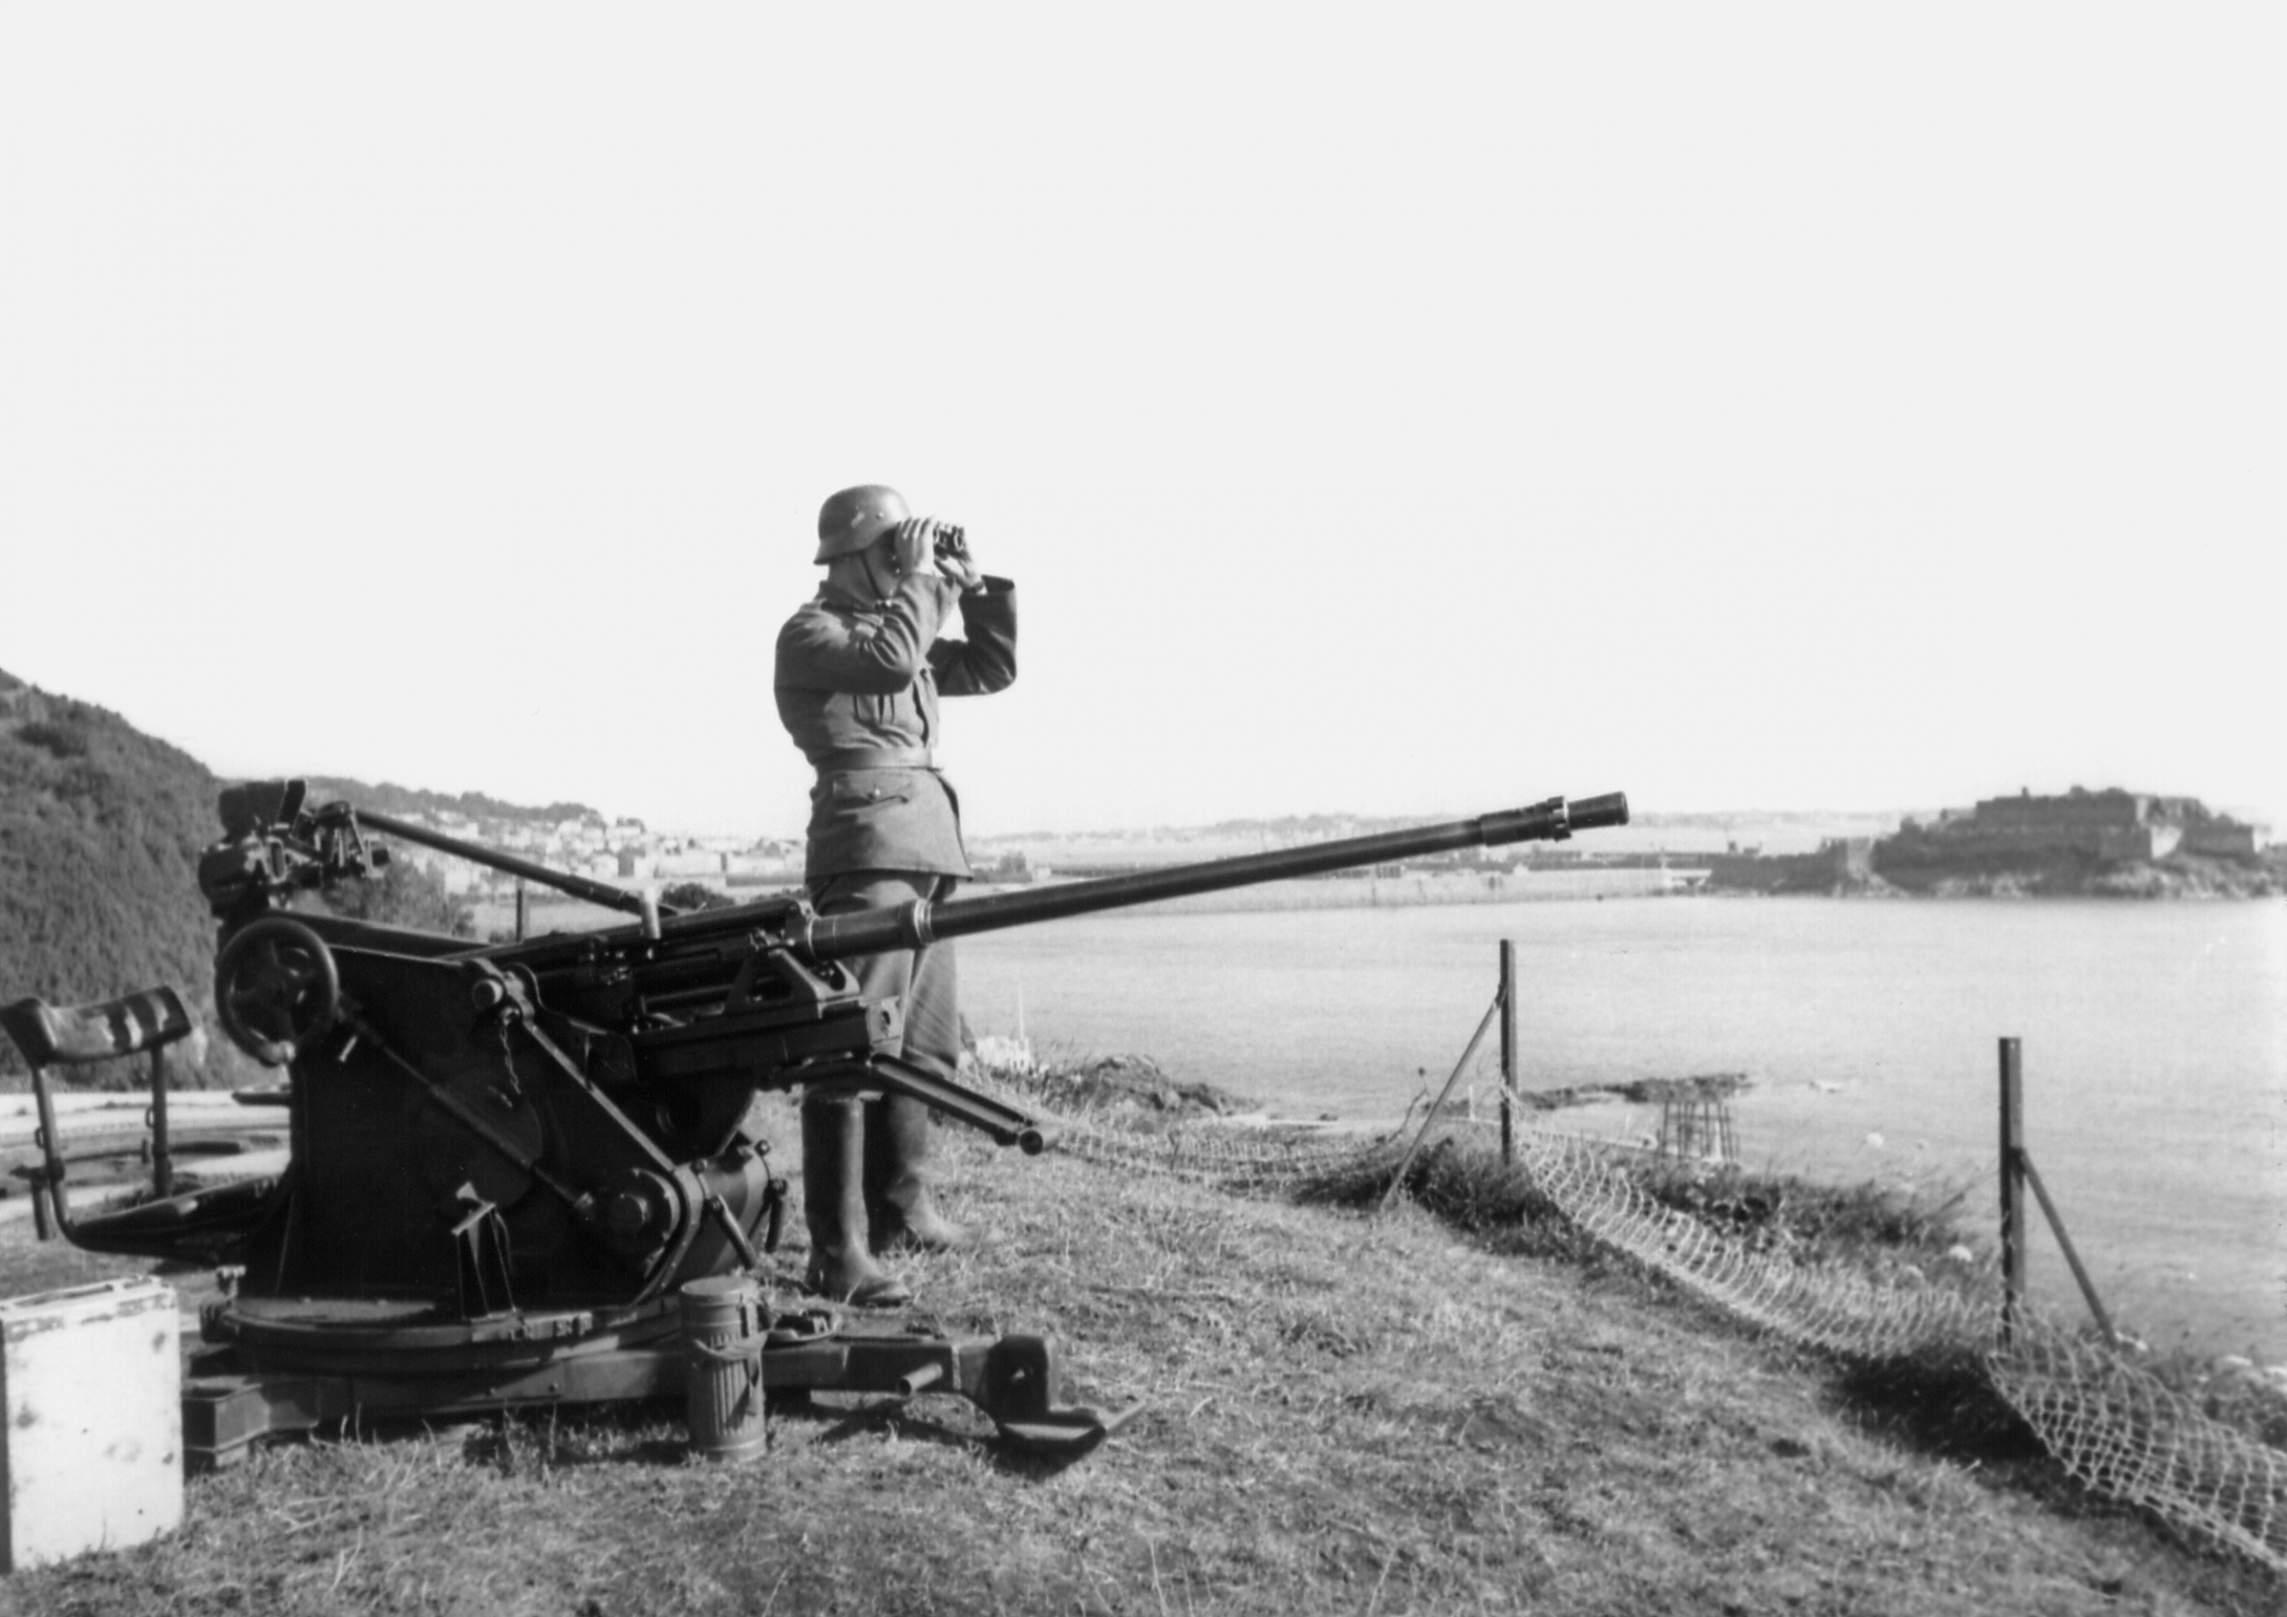 1069400d1493241676-kriegsmarine-binoculars-7-x-50-flak-kuste-kriegsmaine-coastal-artillery.jpg